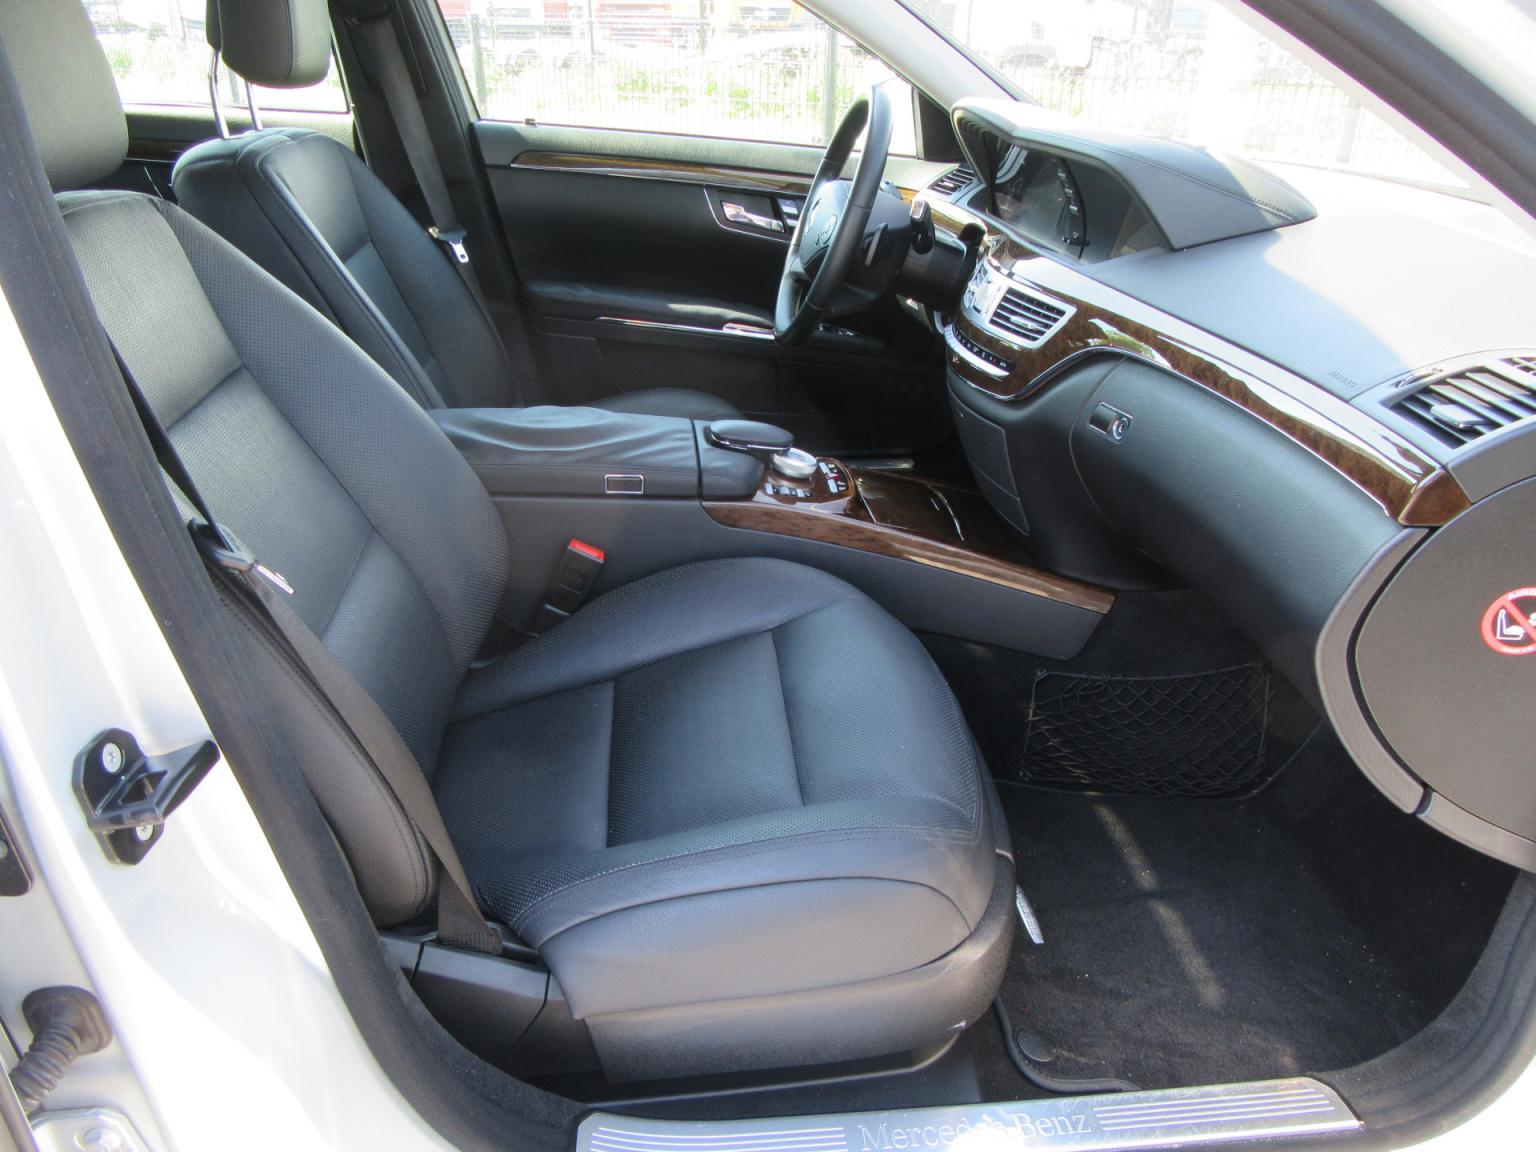 Mercedes-Benz-S-Klasse-13